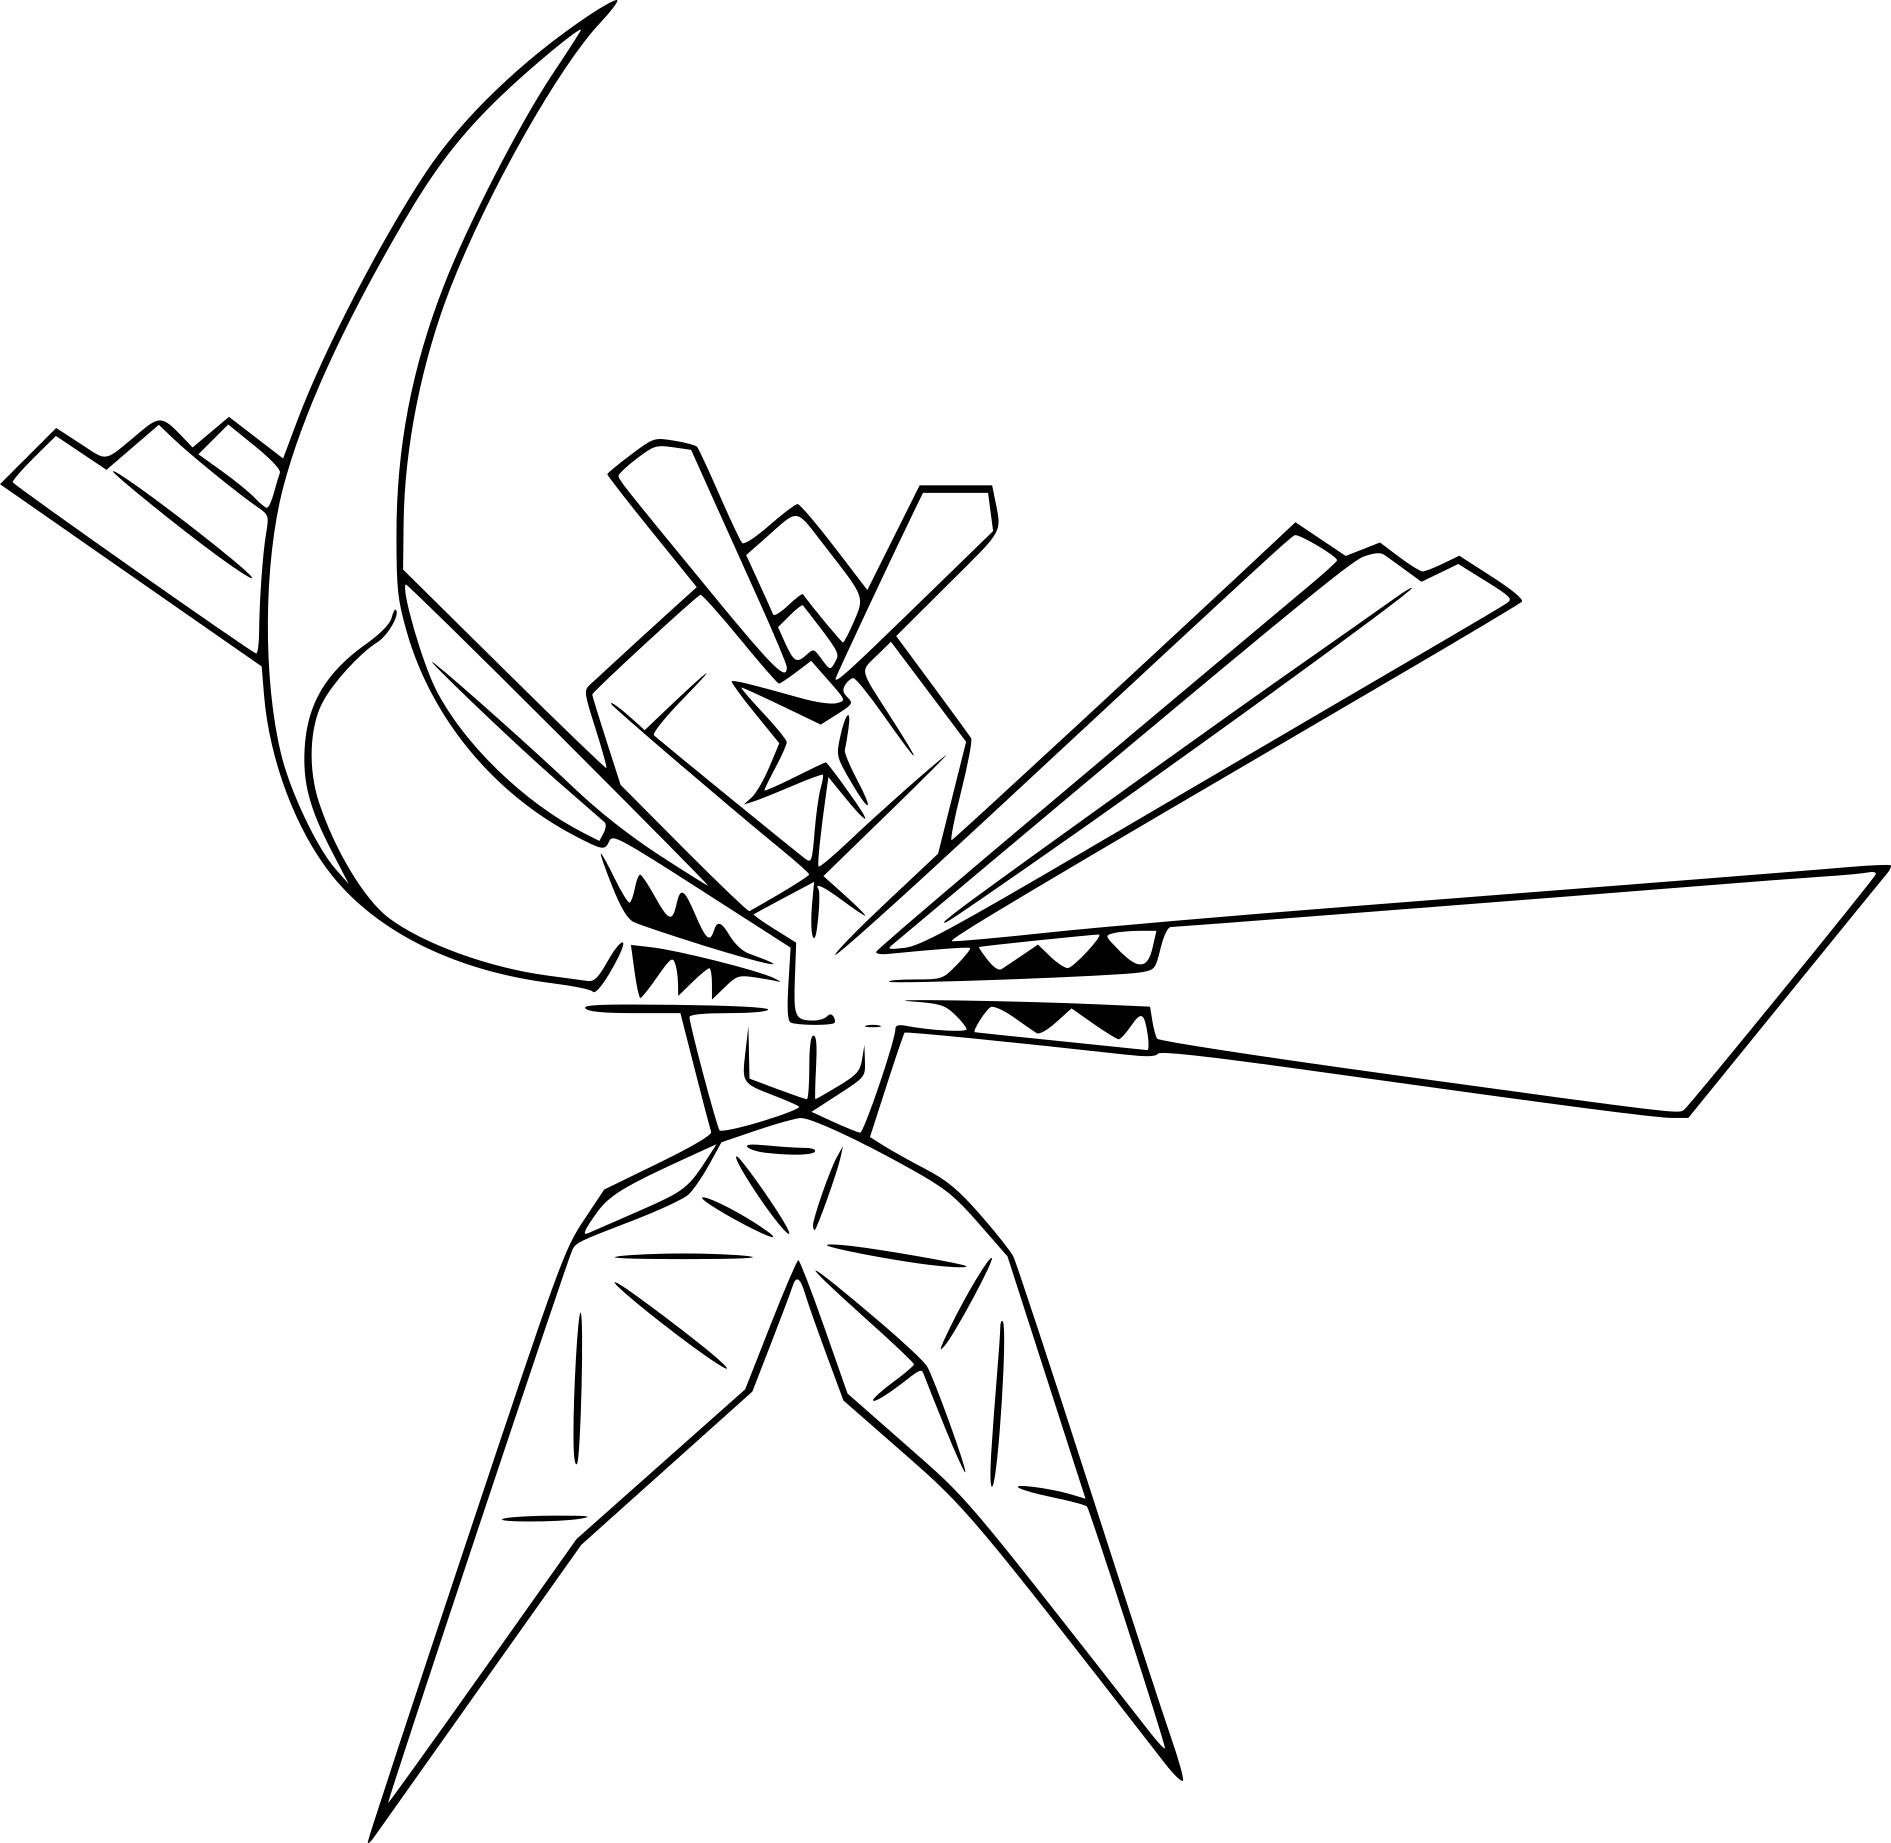 Coloriage katagami pokemon imprimer - Dessin de pokemon a imprimer ...